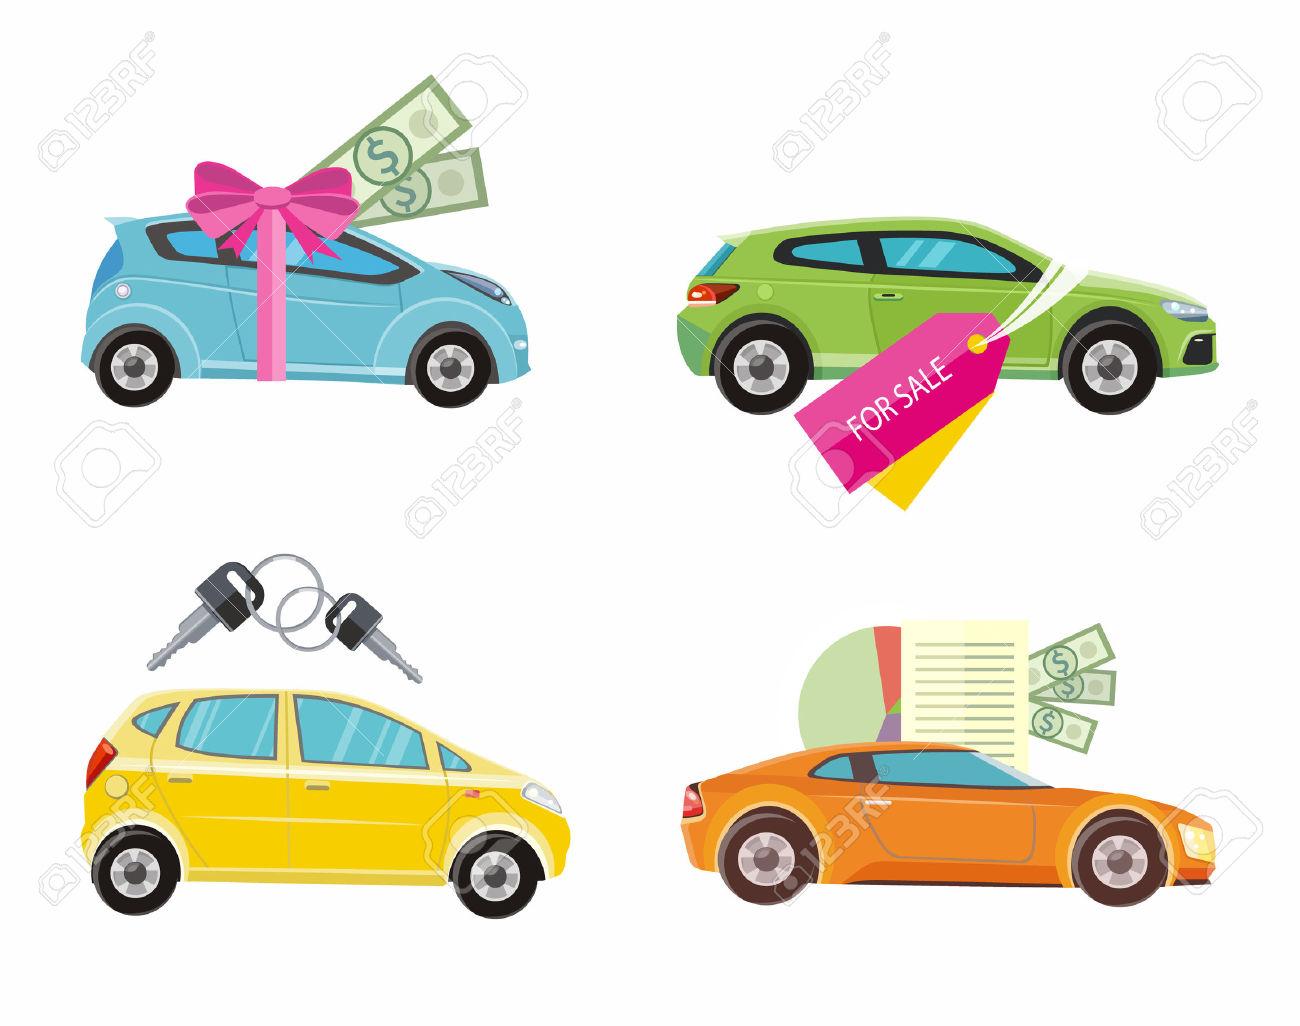 1,368 Car Dealership Cliparts, Stock Vector And Royalty Free Car.